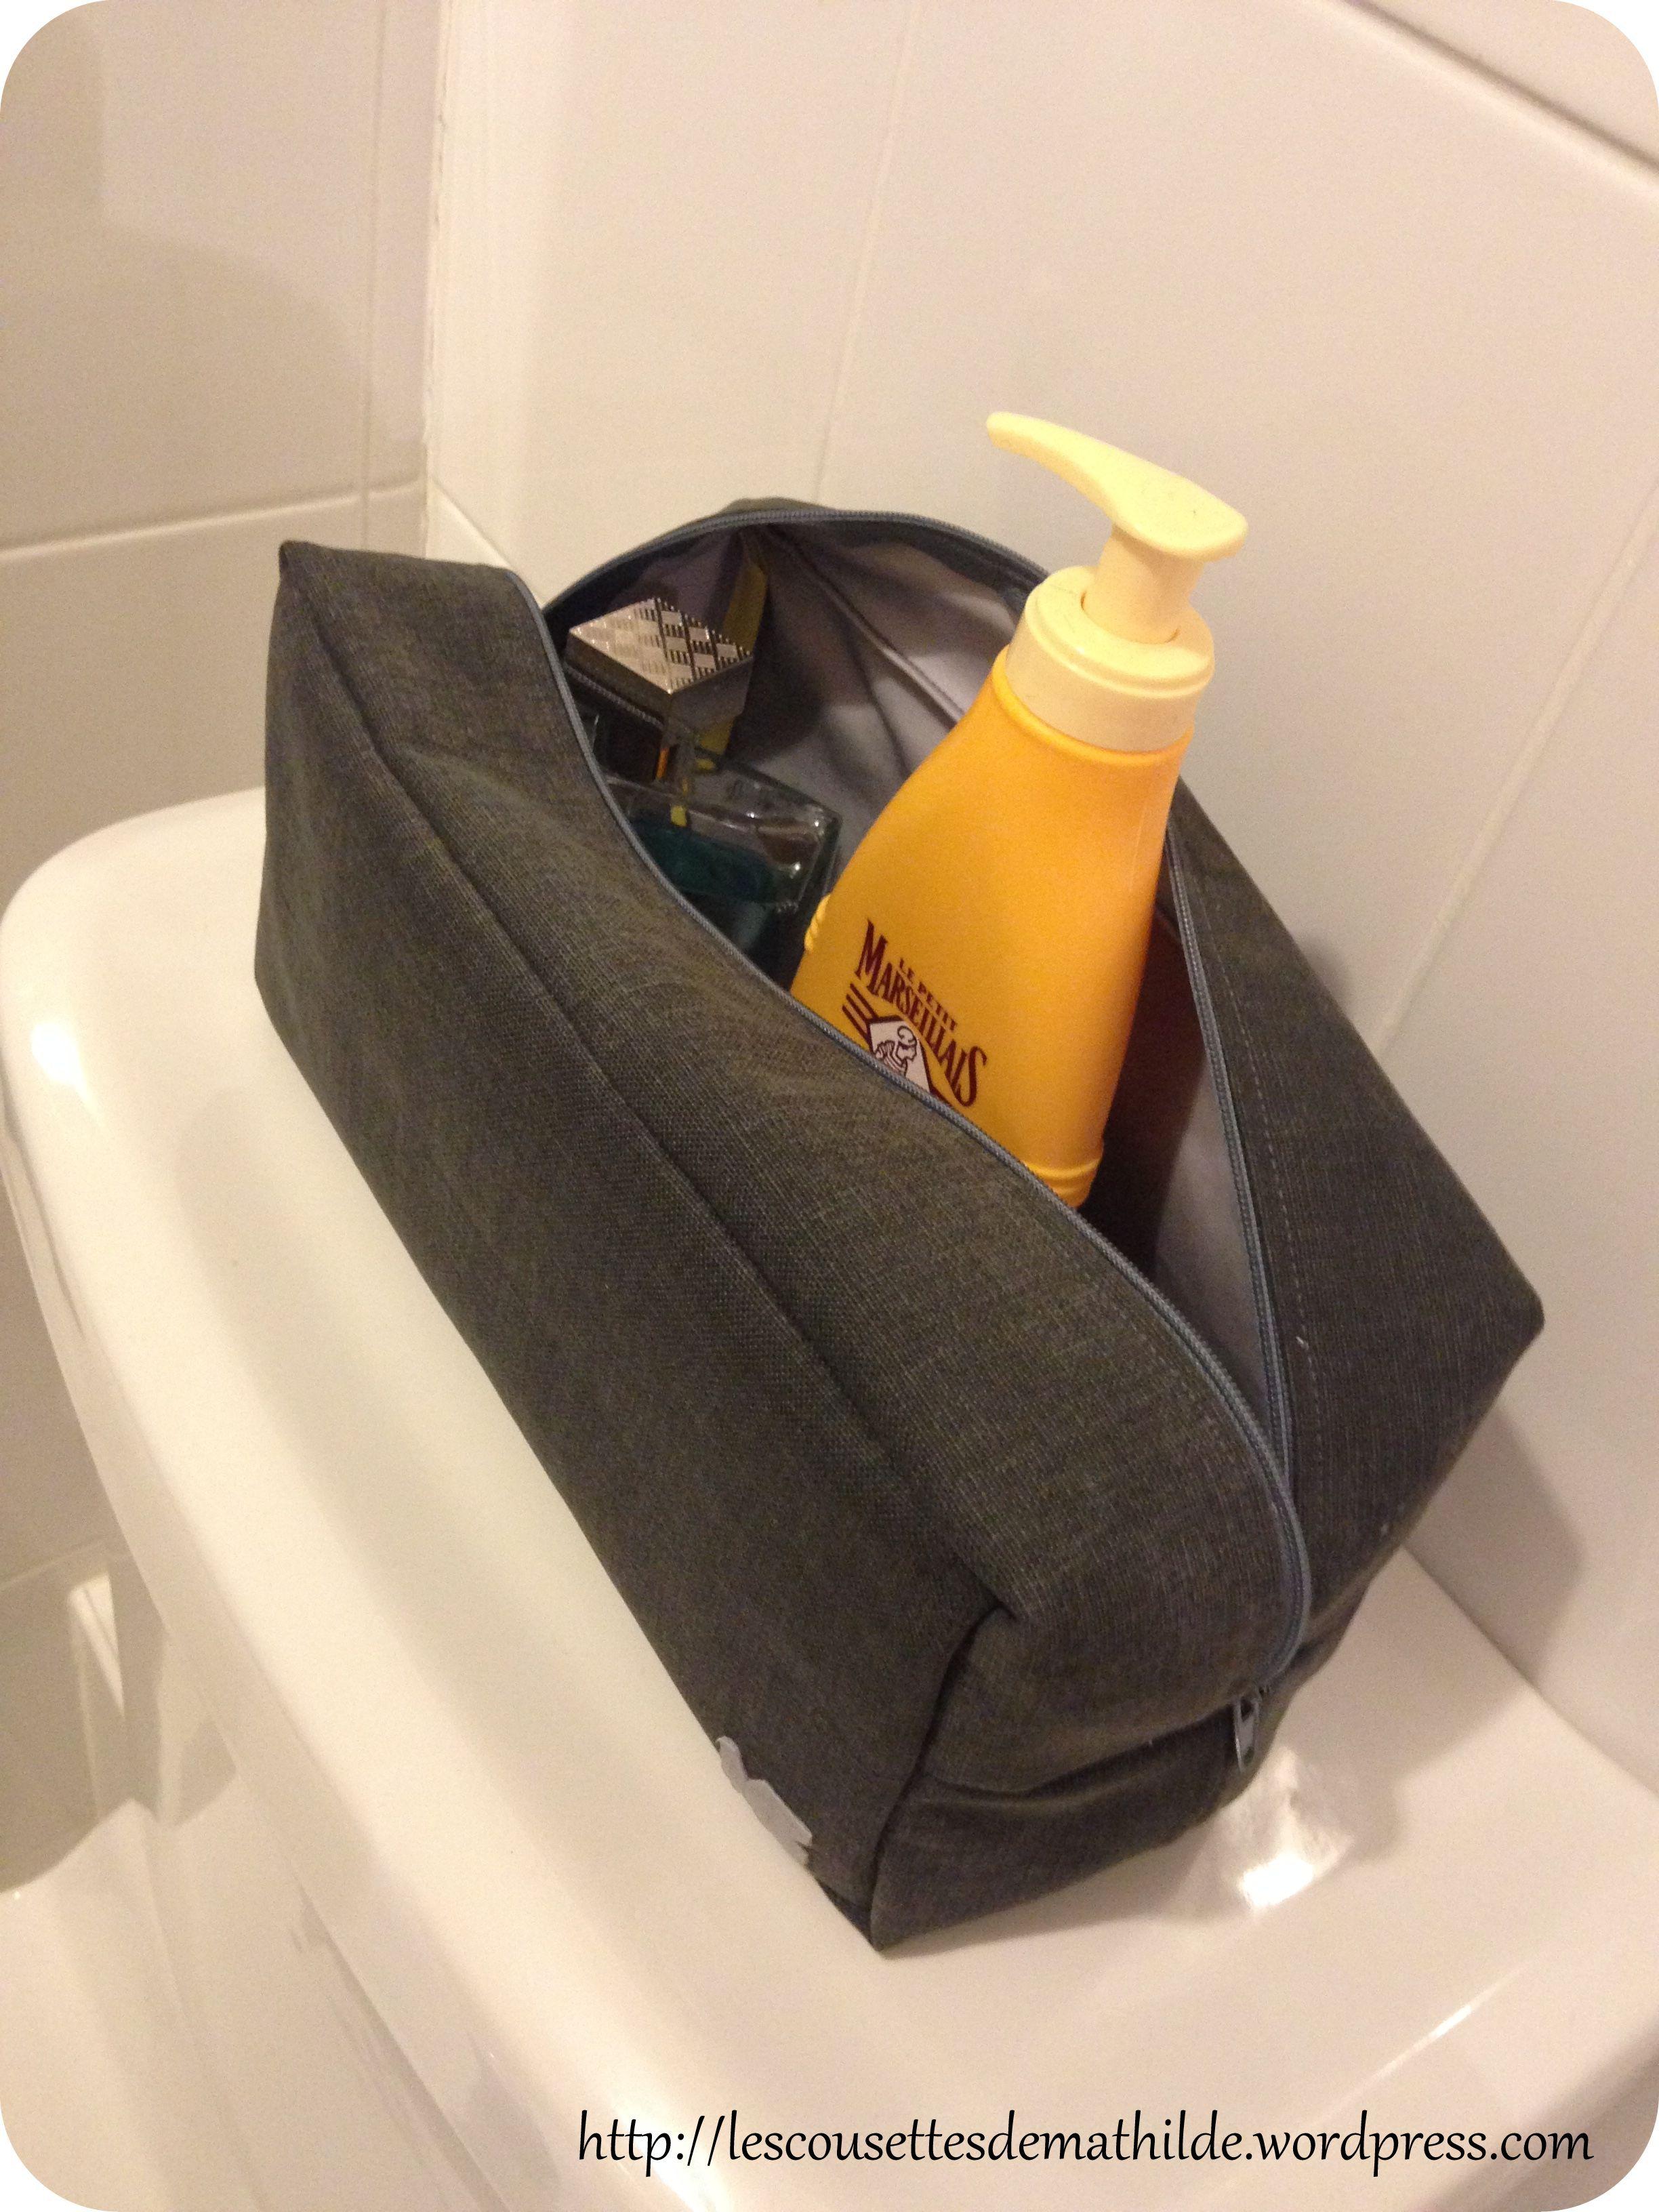 Tuto Trousse De Toilette Madalena : trousse, toilette, madalena, Tutoriel, Trousse, Toilette, Homme, Homme,, Toilette,, Couture